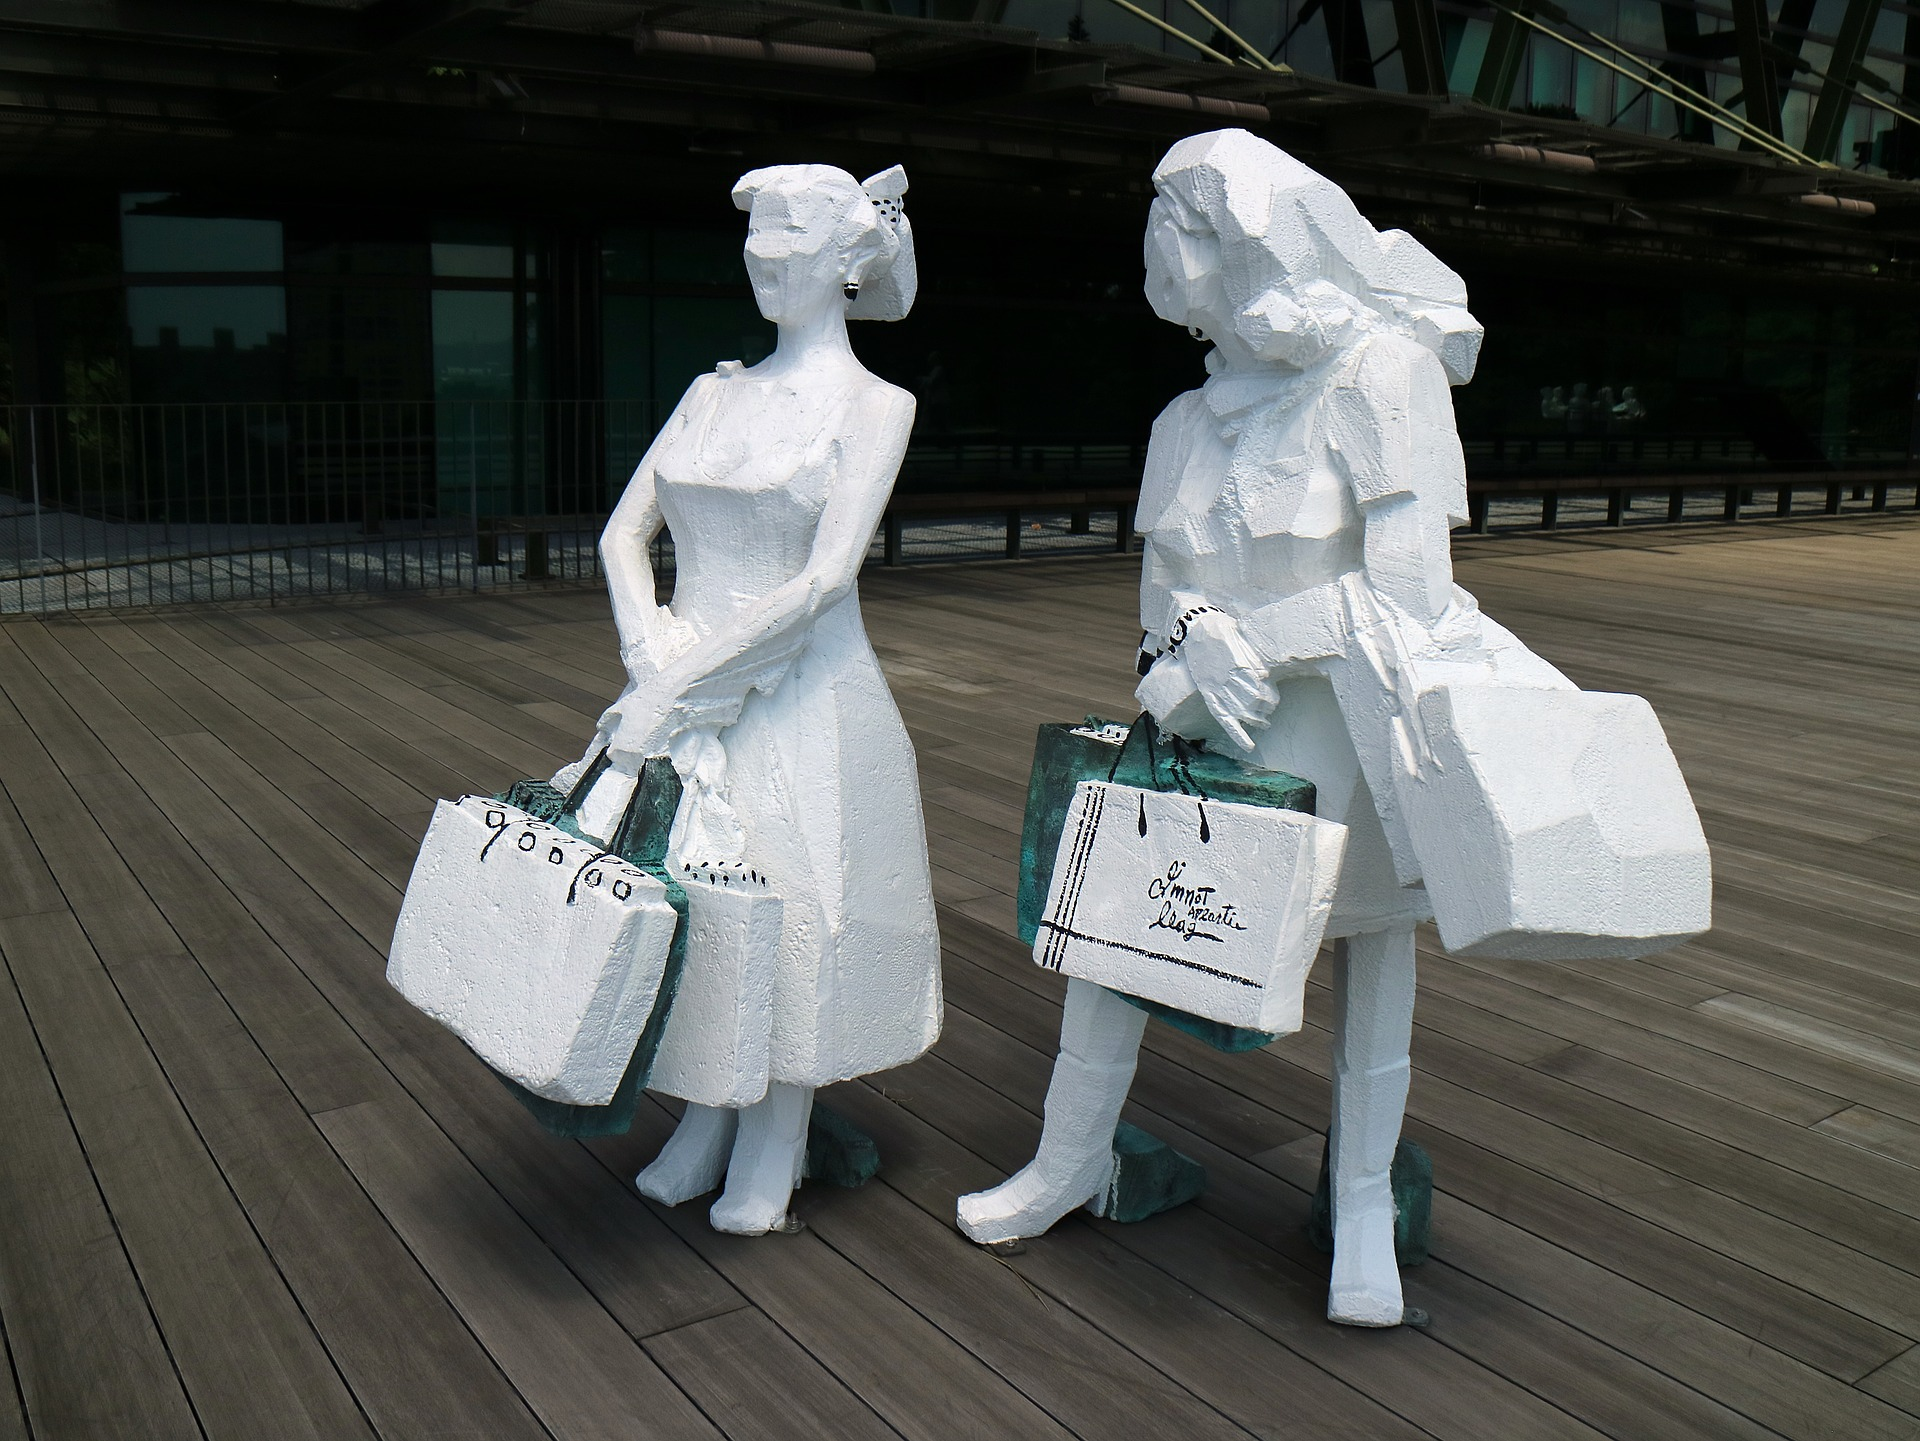 shopping-2518248_1920